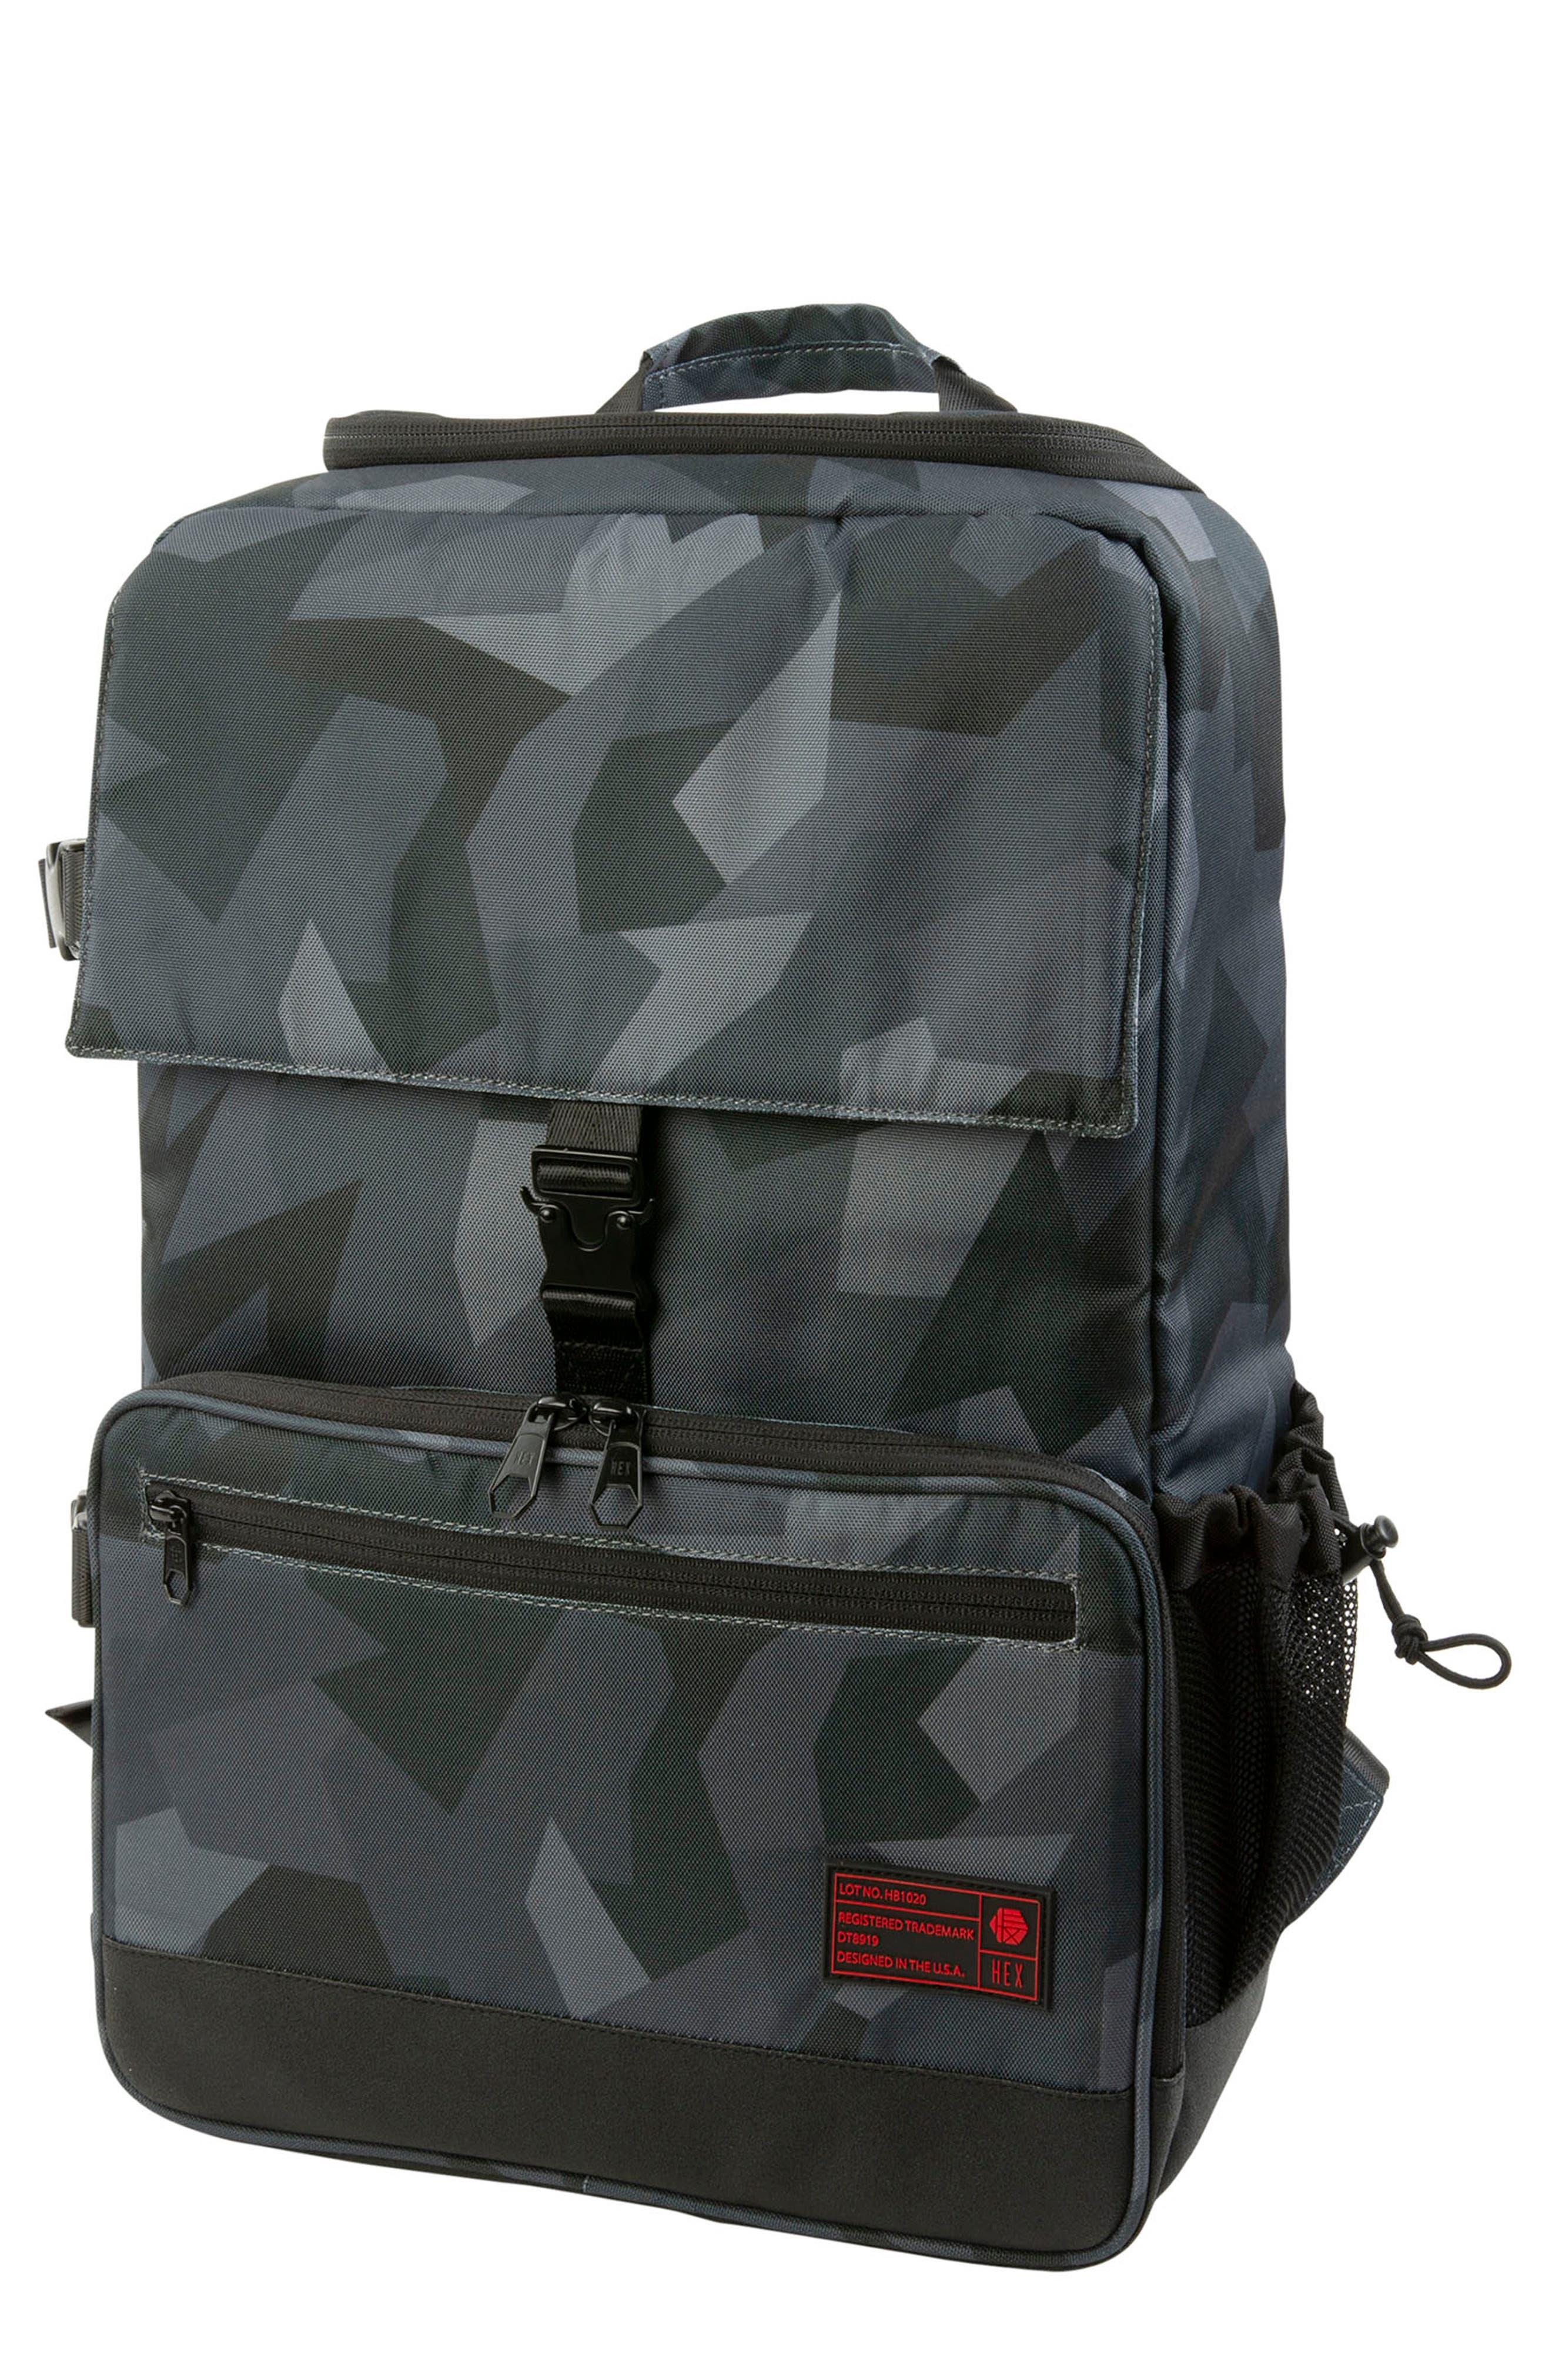 Ranger Camera Canvas Backpack